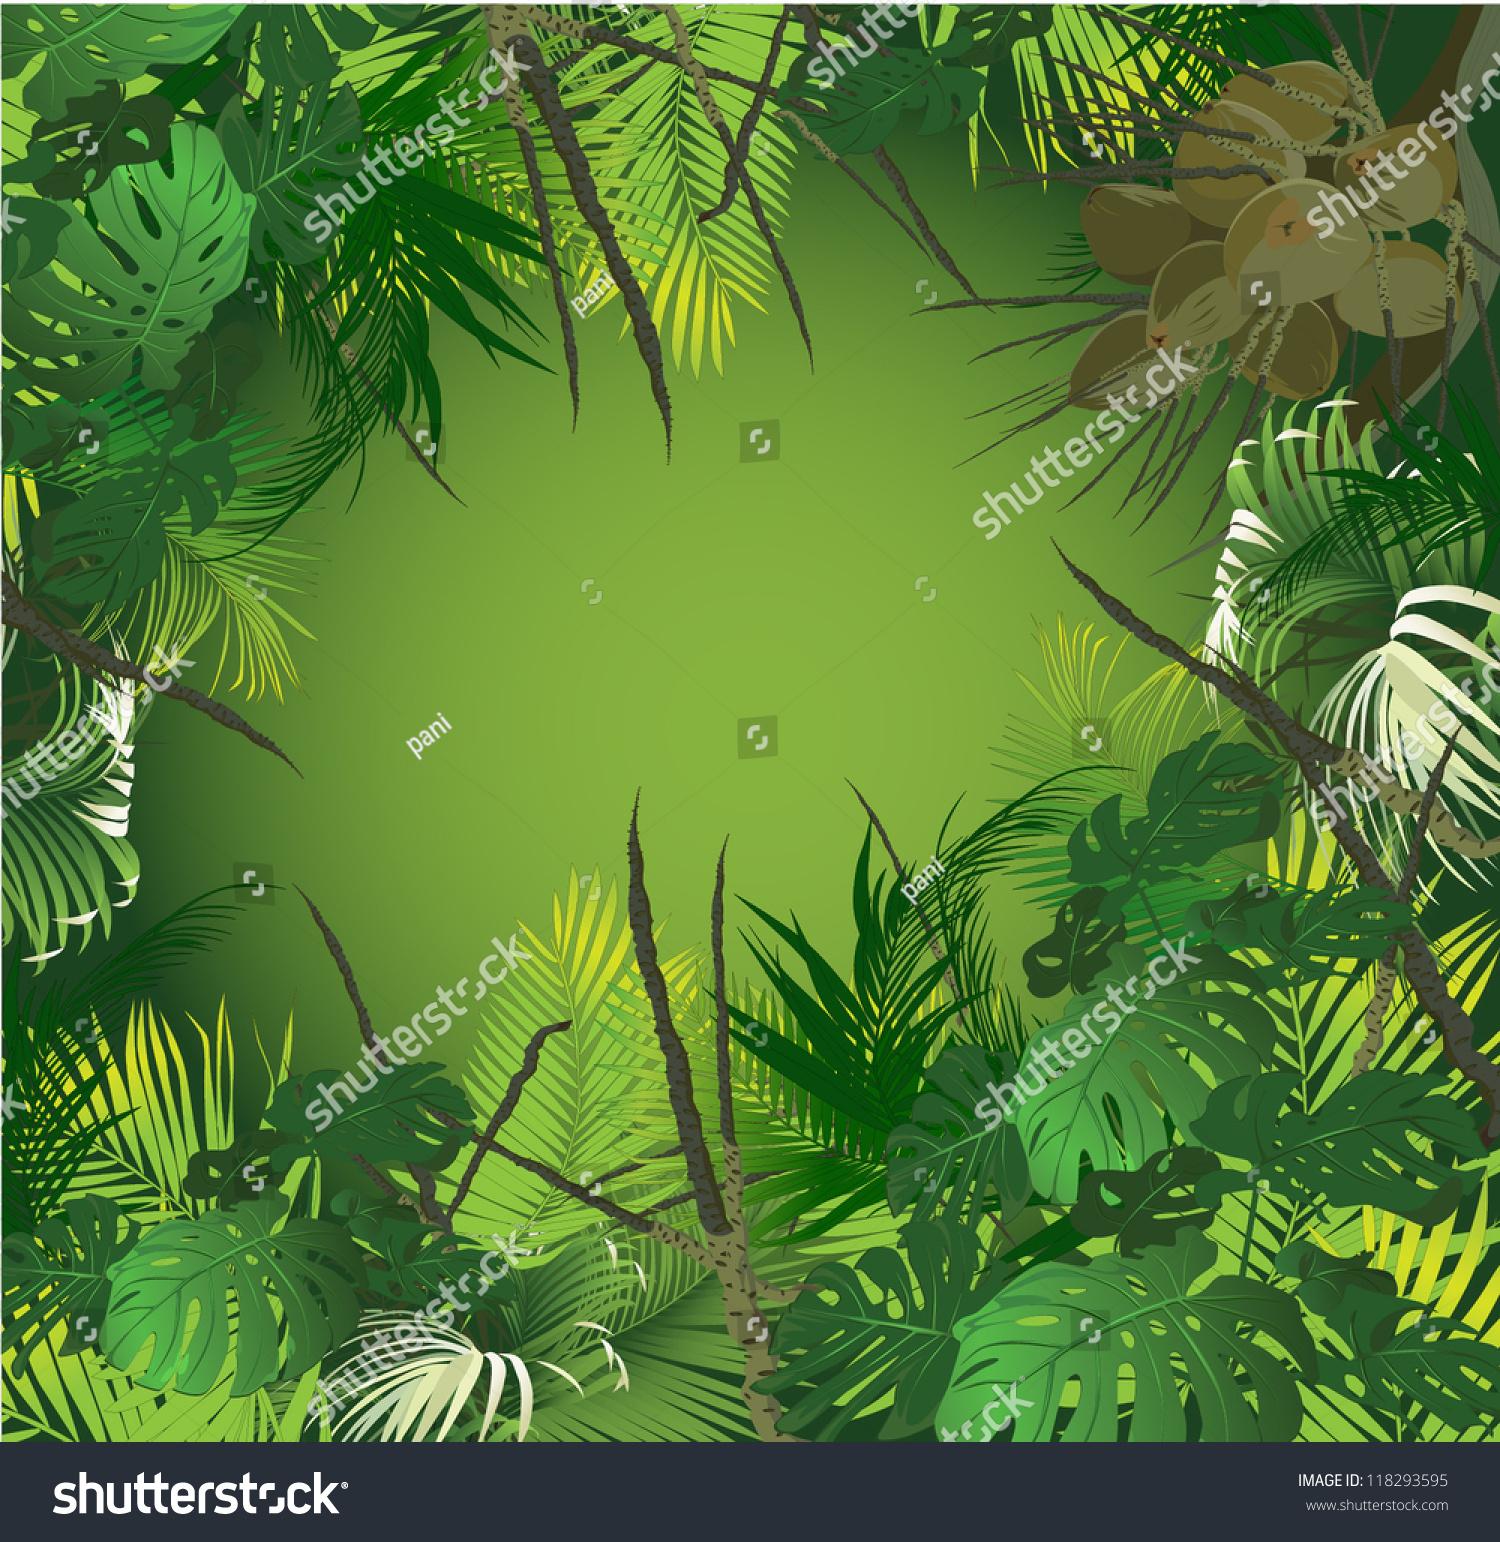 vector scenery tropical - photo #18